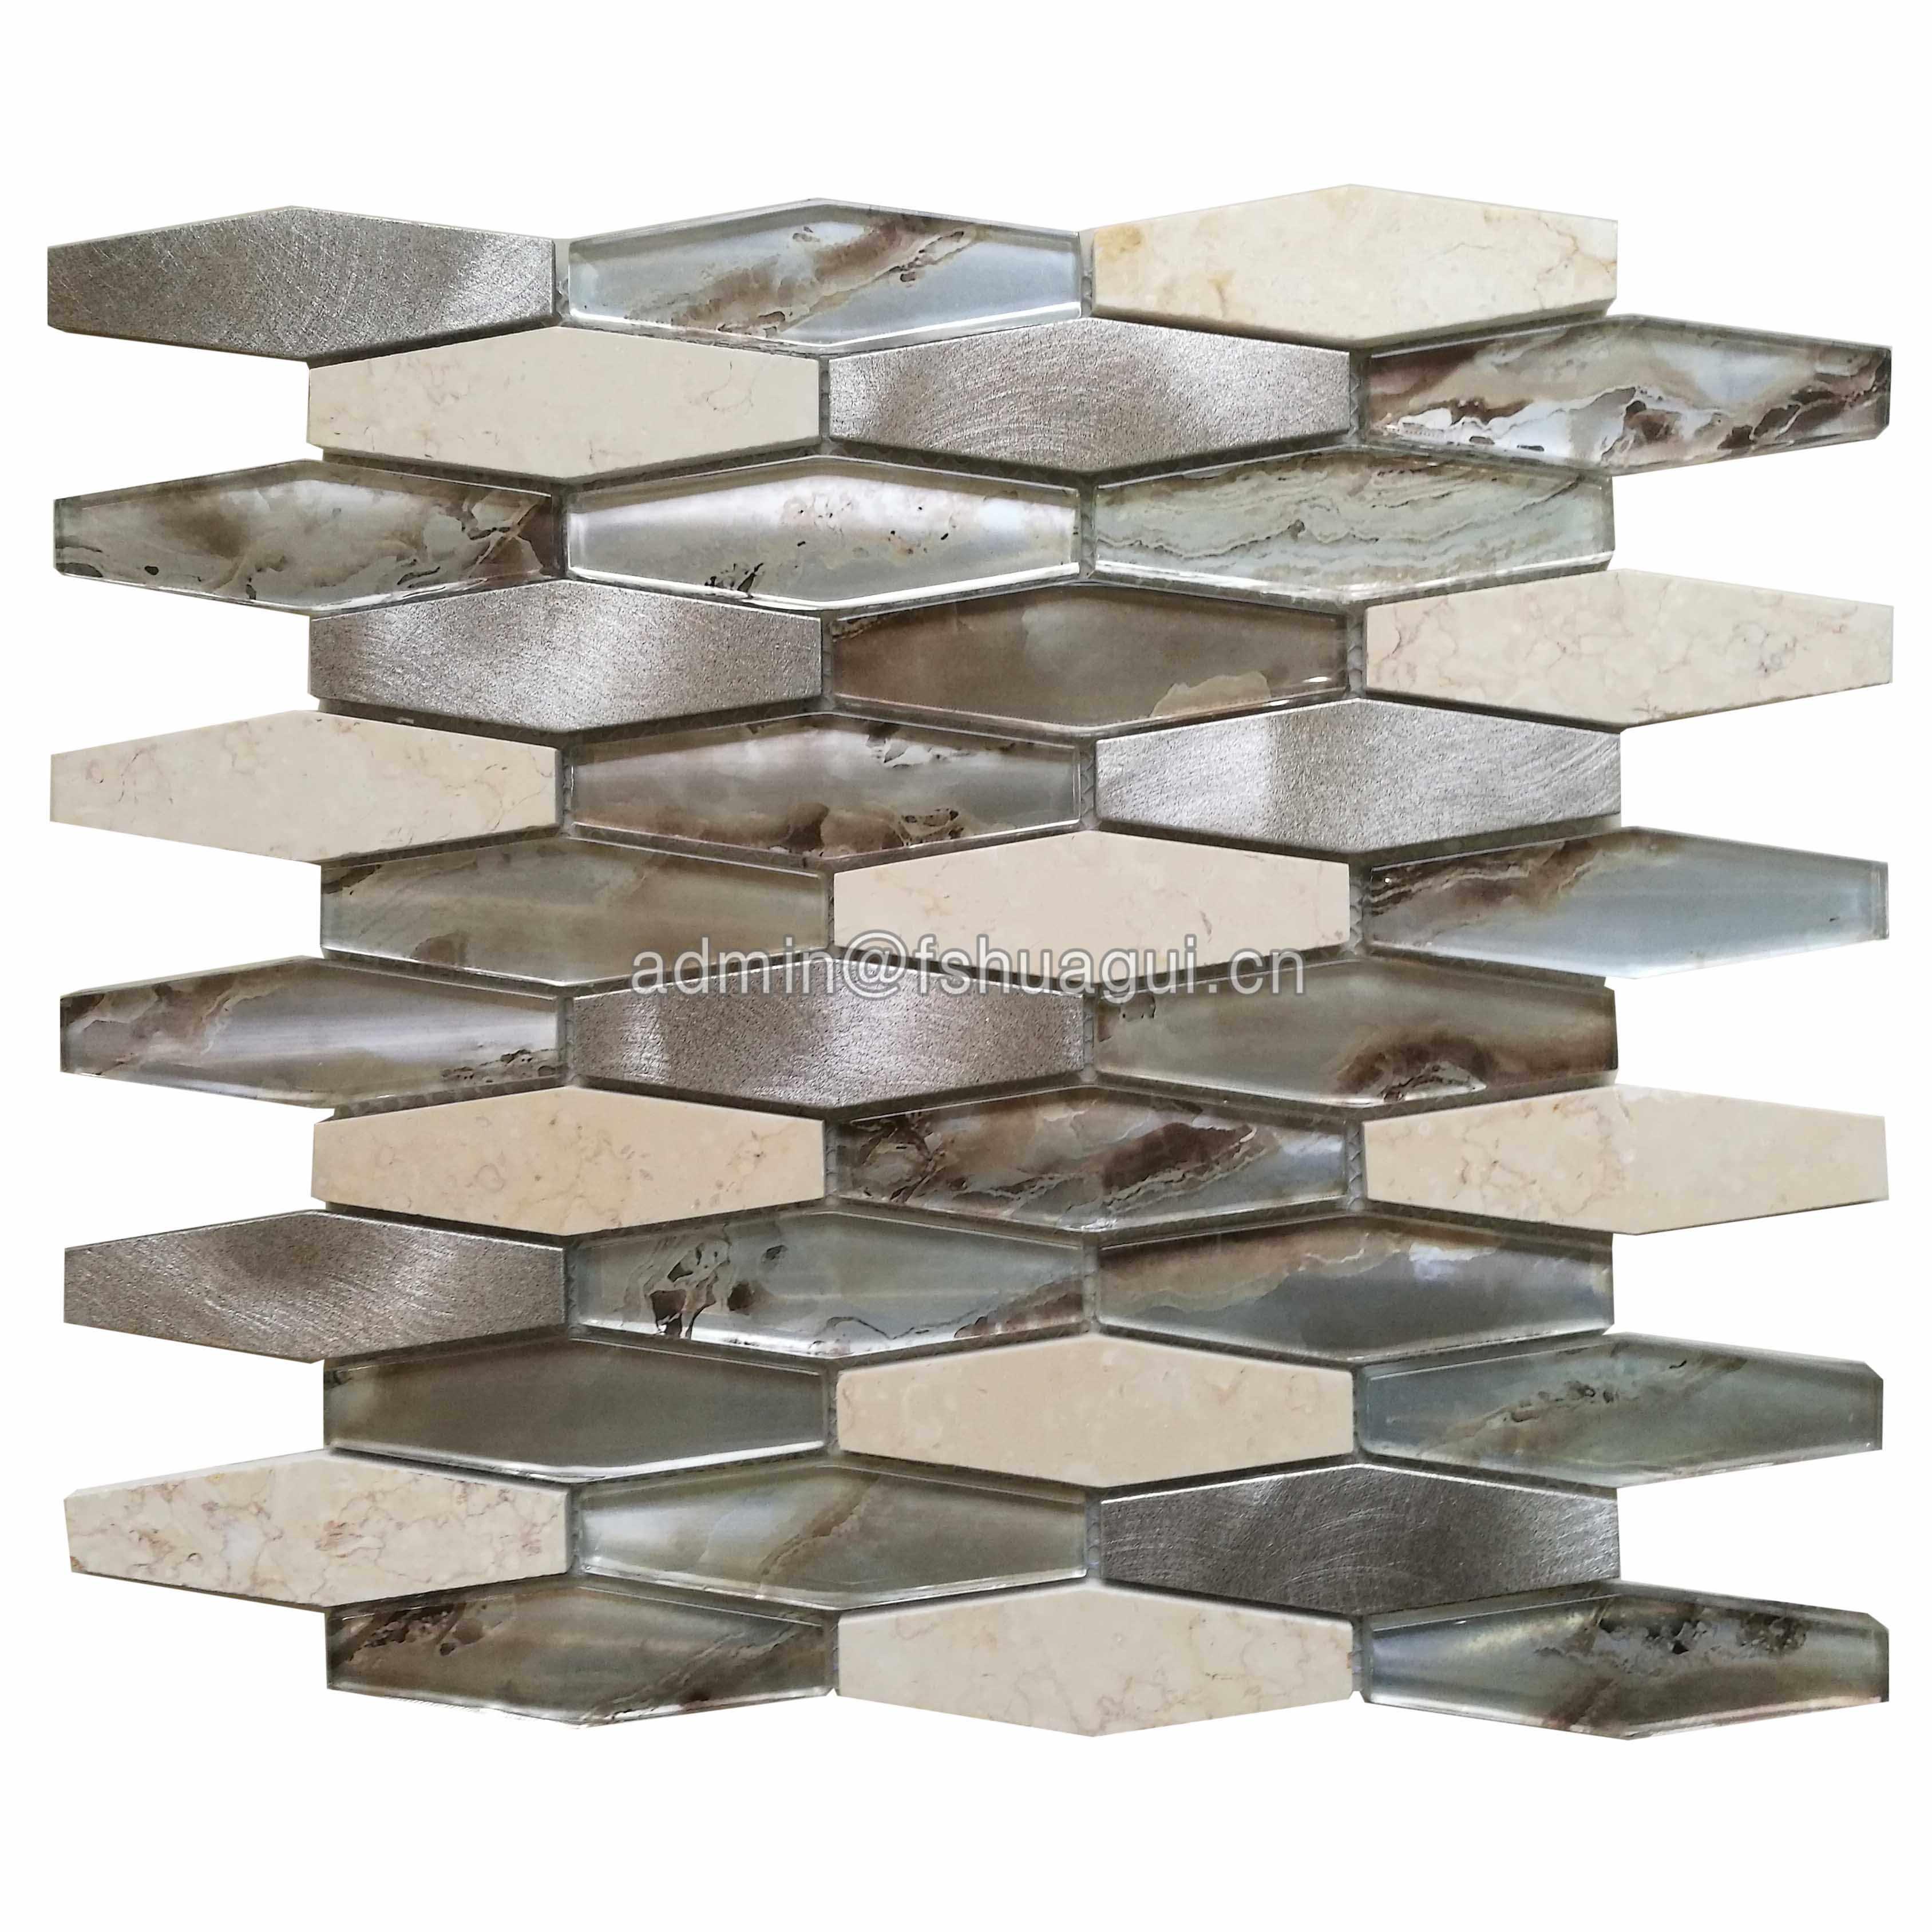 Huagui Metro Long Hexagon Aluminum and Glass Stone Mosaic Tiles GLASS MOSAIC TILE image118